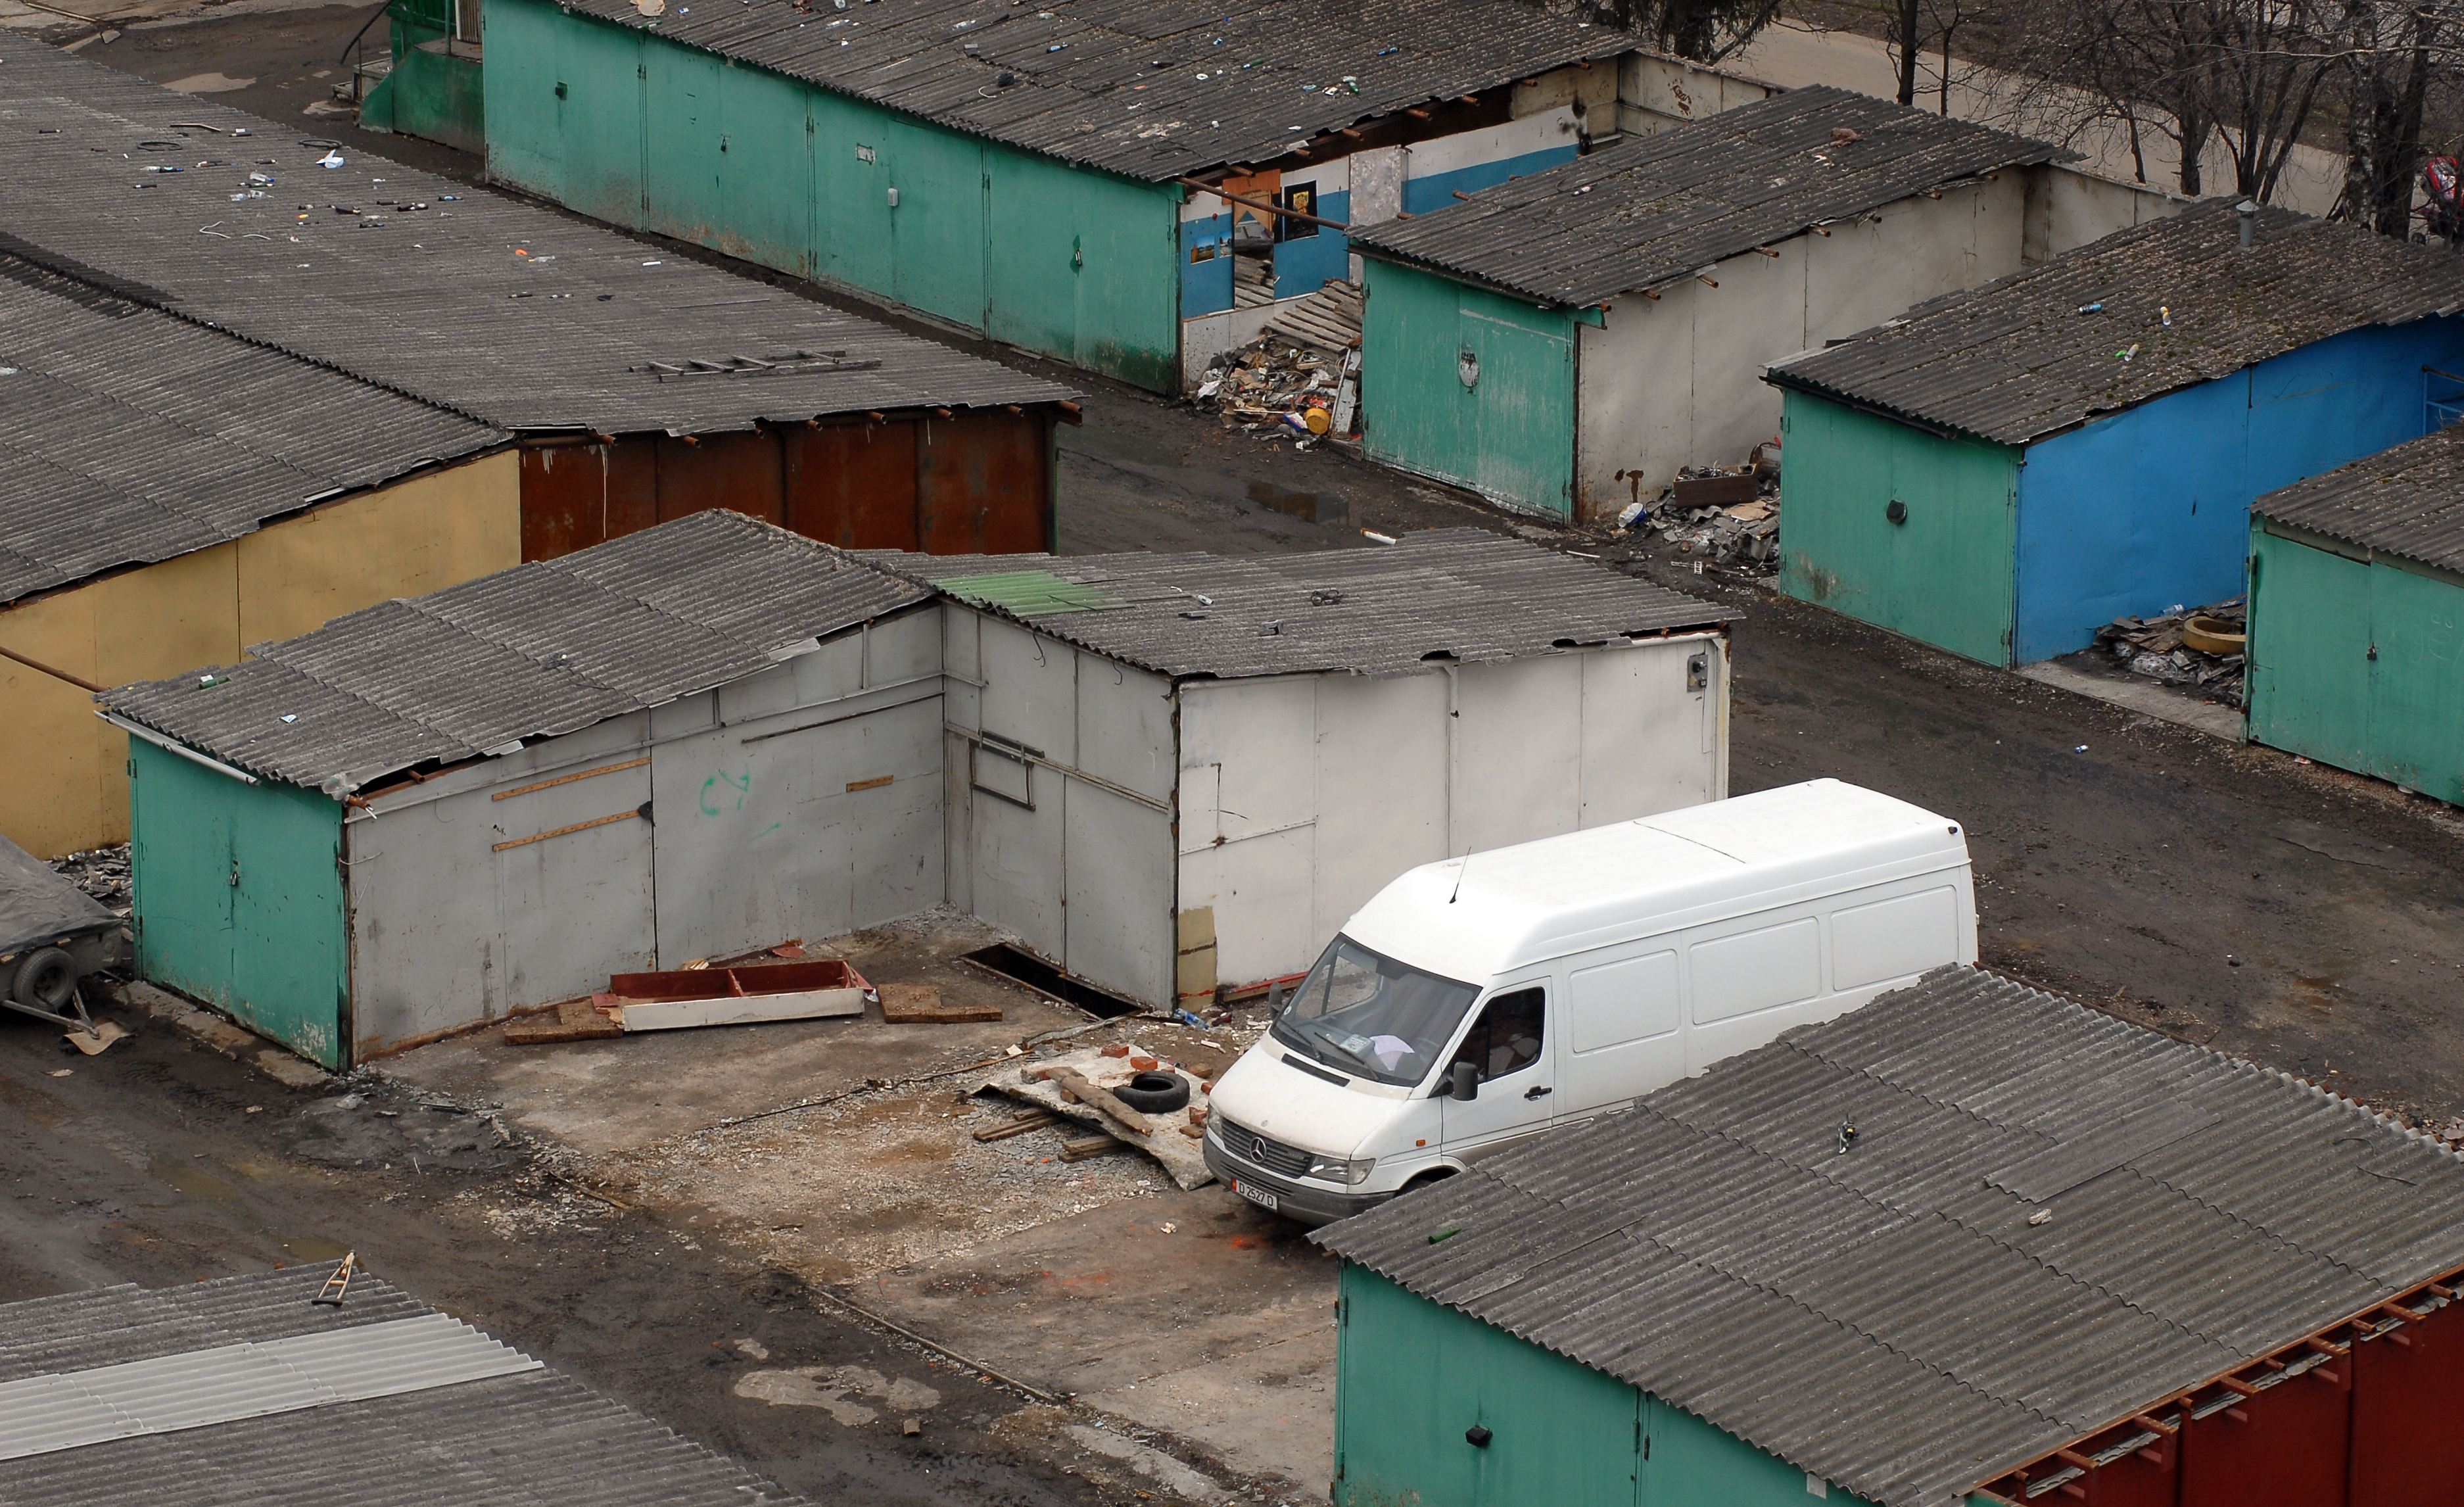 Охранники кооператива вВолгограде закрыли вора вгараже